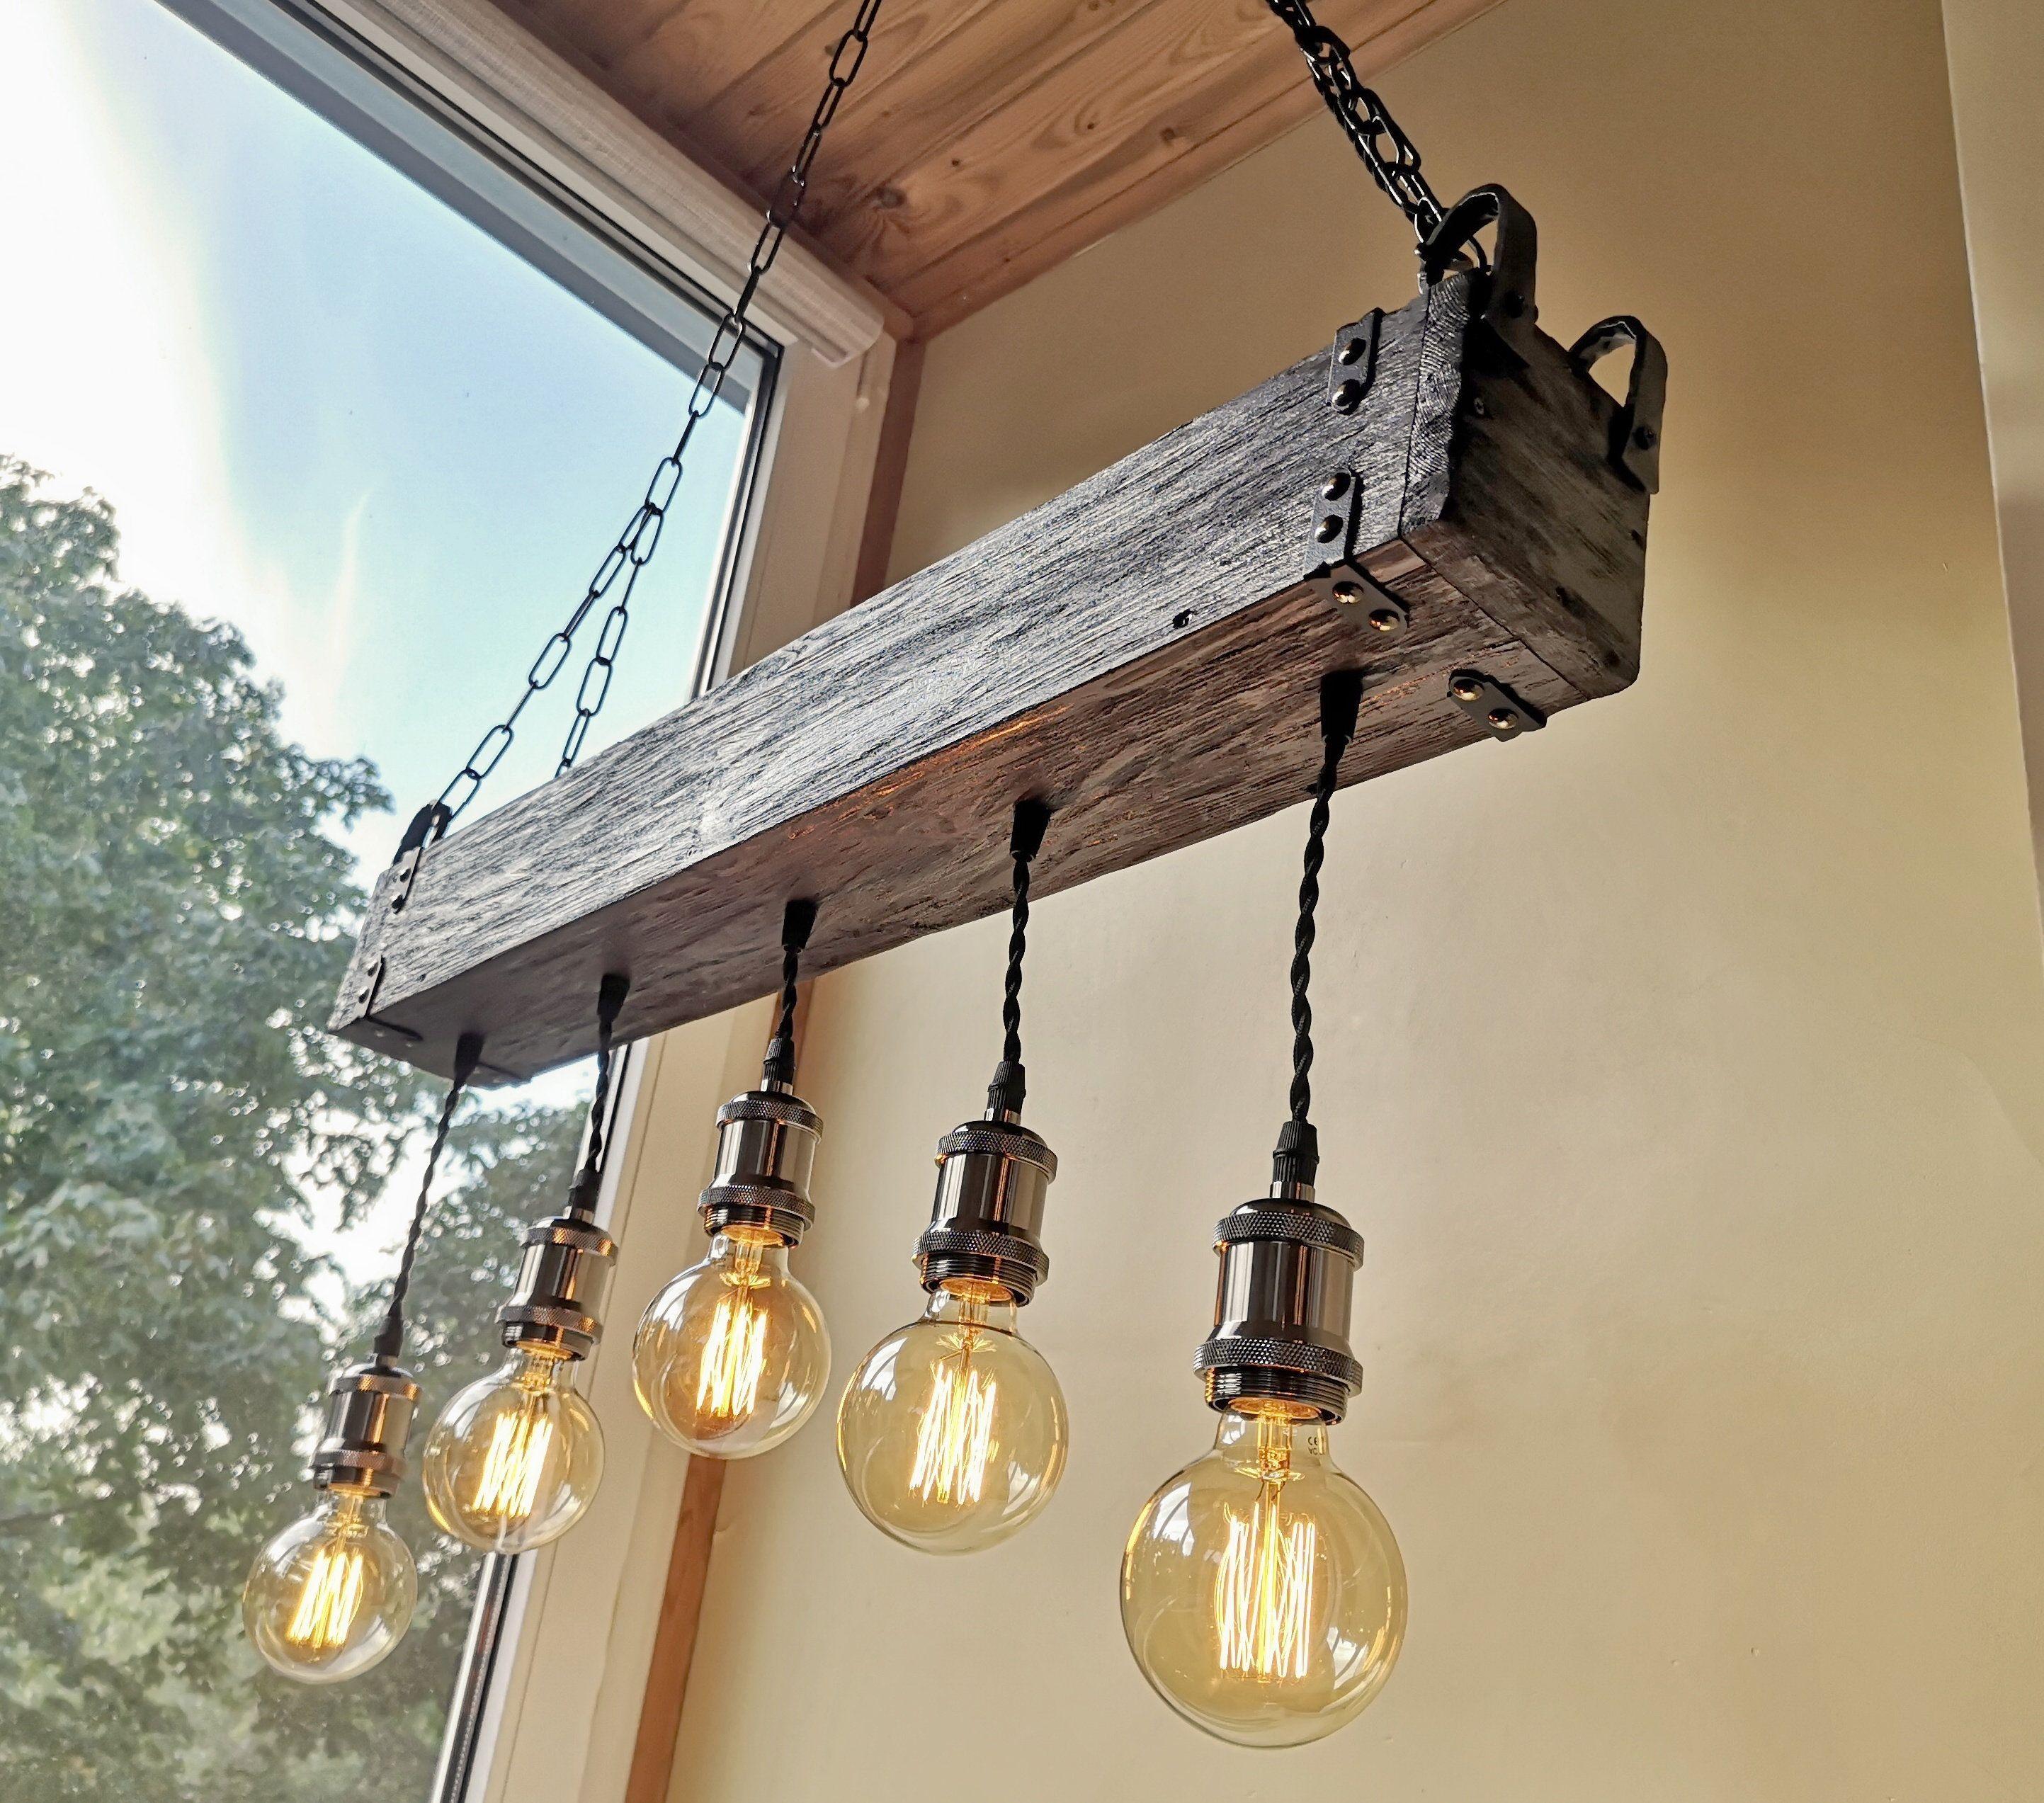 Wood Pendant Lamp Driftwood Hanging Light Three Bulb Wood Lighting Wooden Chandelier Pendant Light Wood Lamp Ceiling Light Rustic In 2020 Wood Pendant Lamps Wood Lamps Wooden Lamp